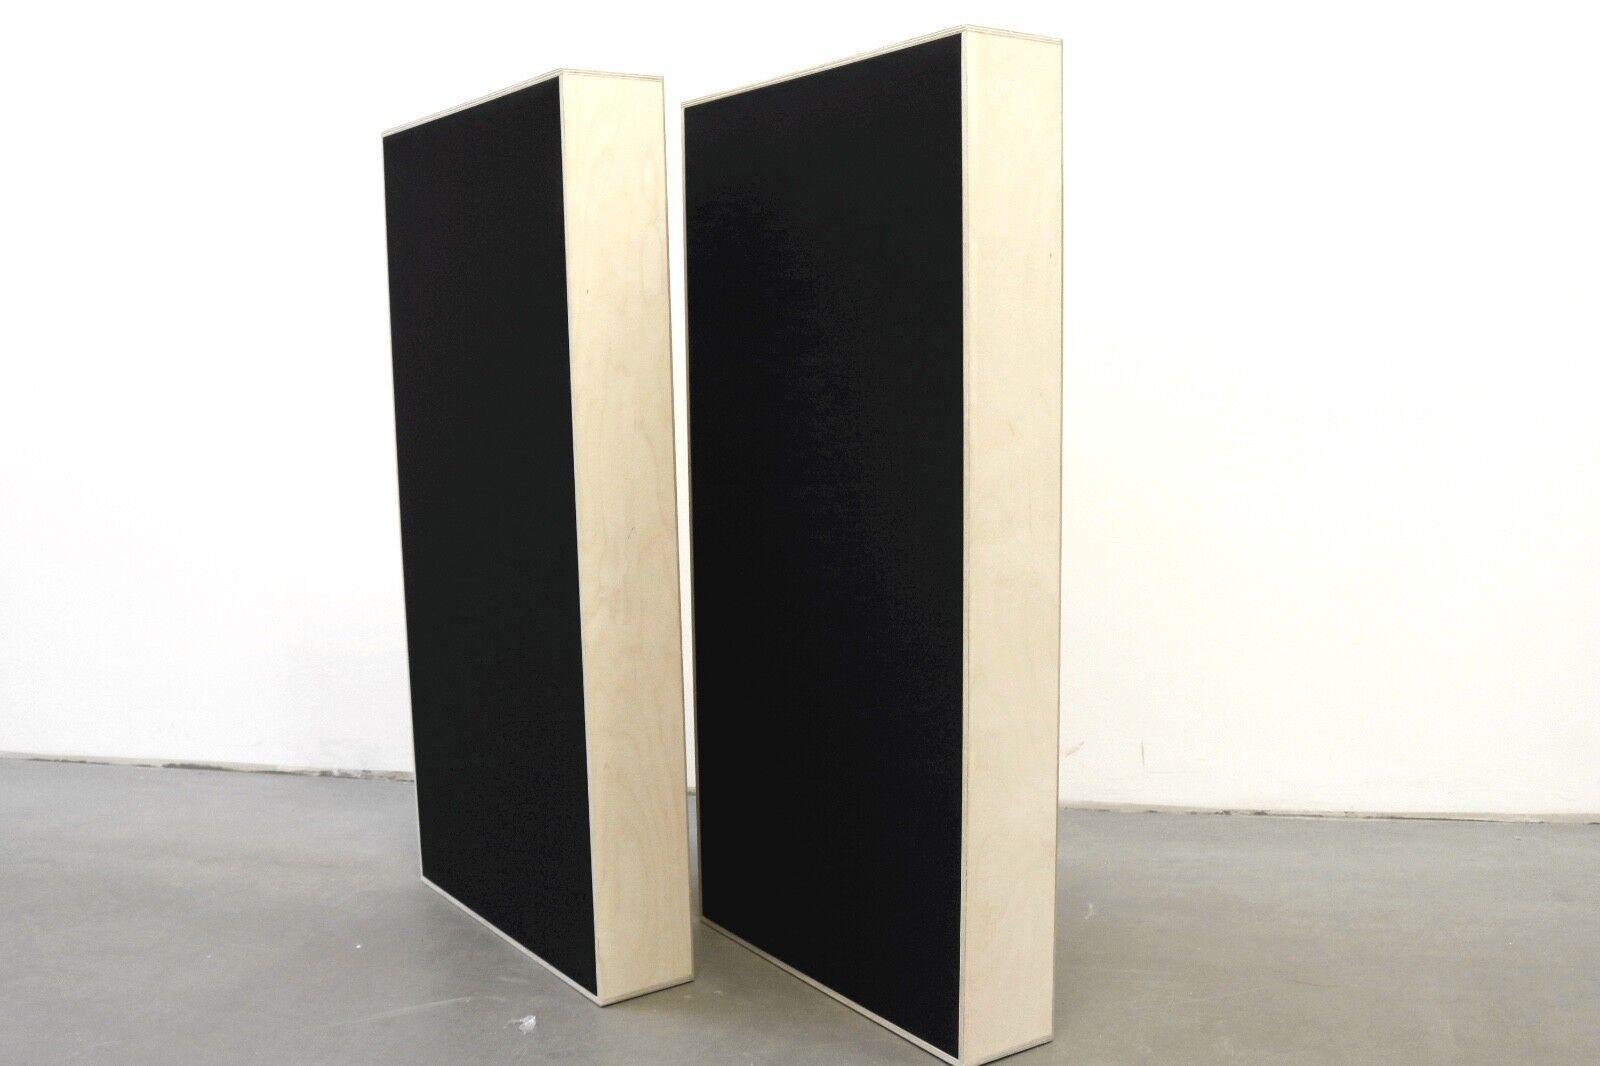 2x Absorber Model PREMIUM aus Basotect für Tonstudio Heimkino Büro Wohnraum uvm.